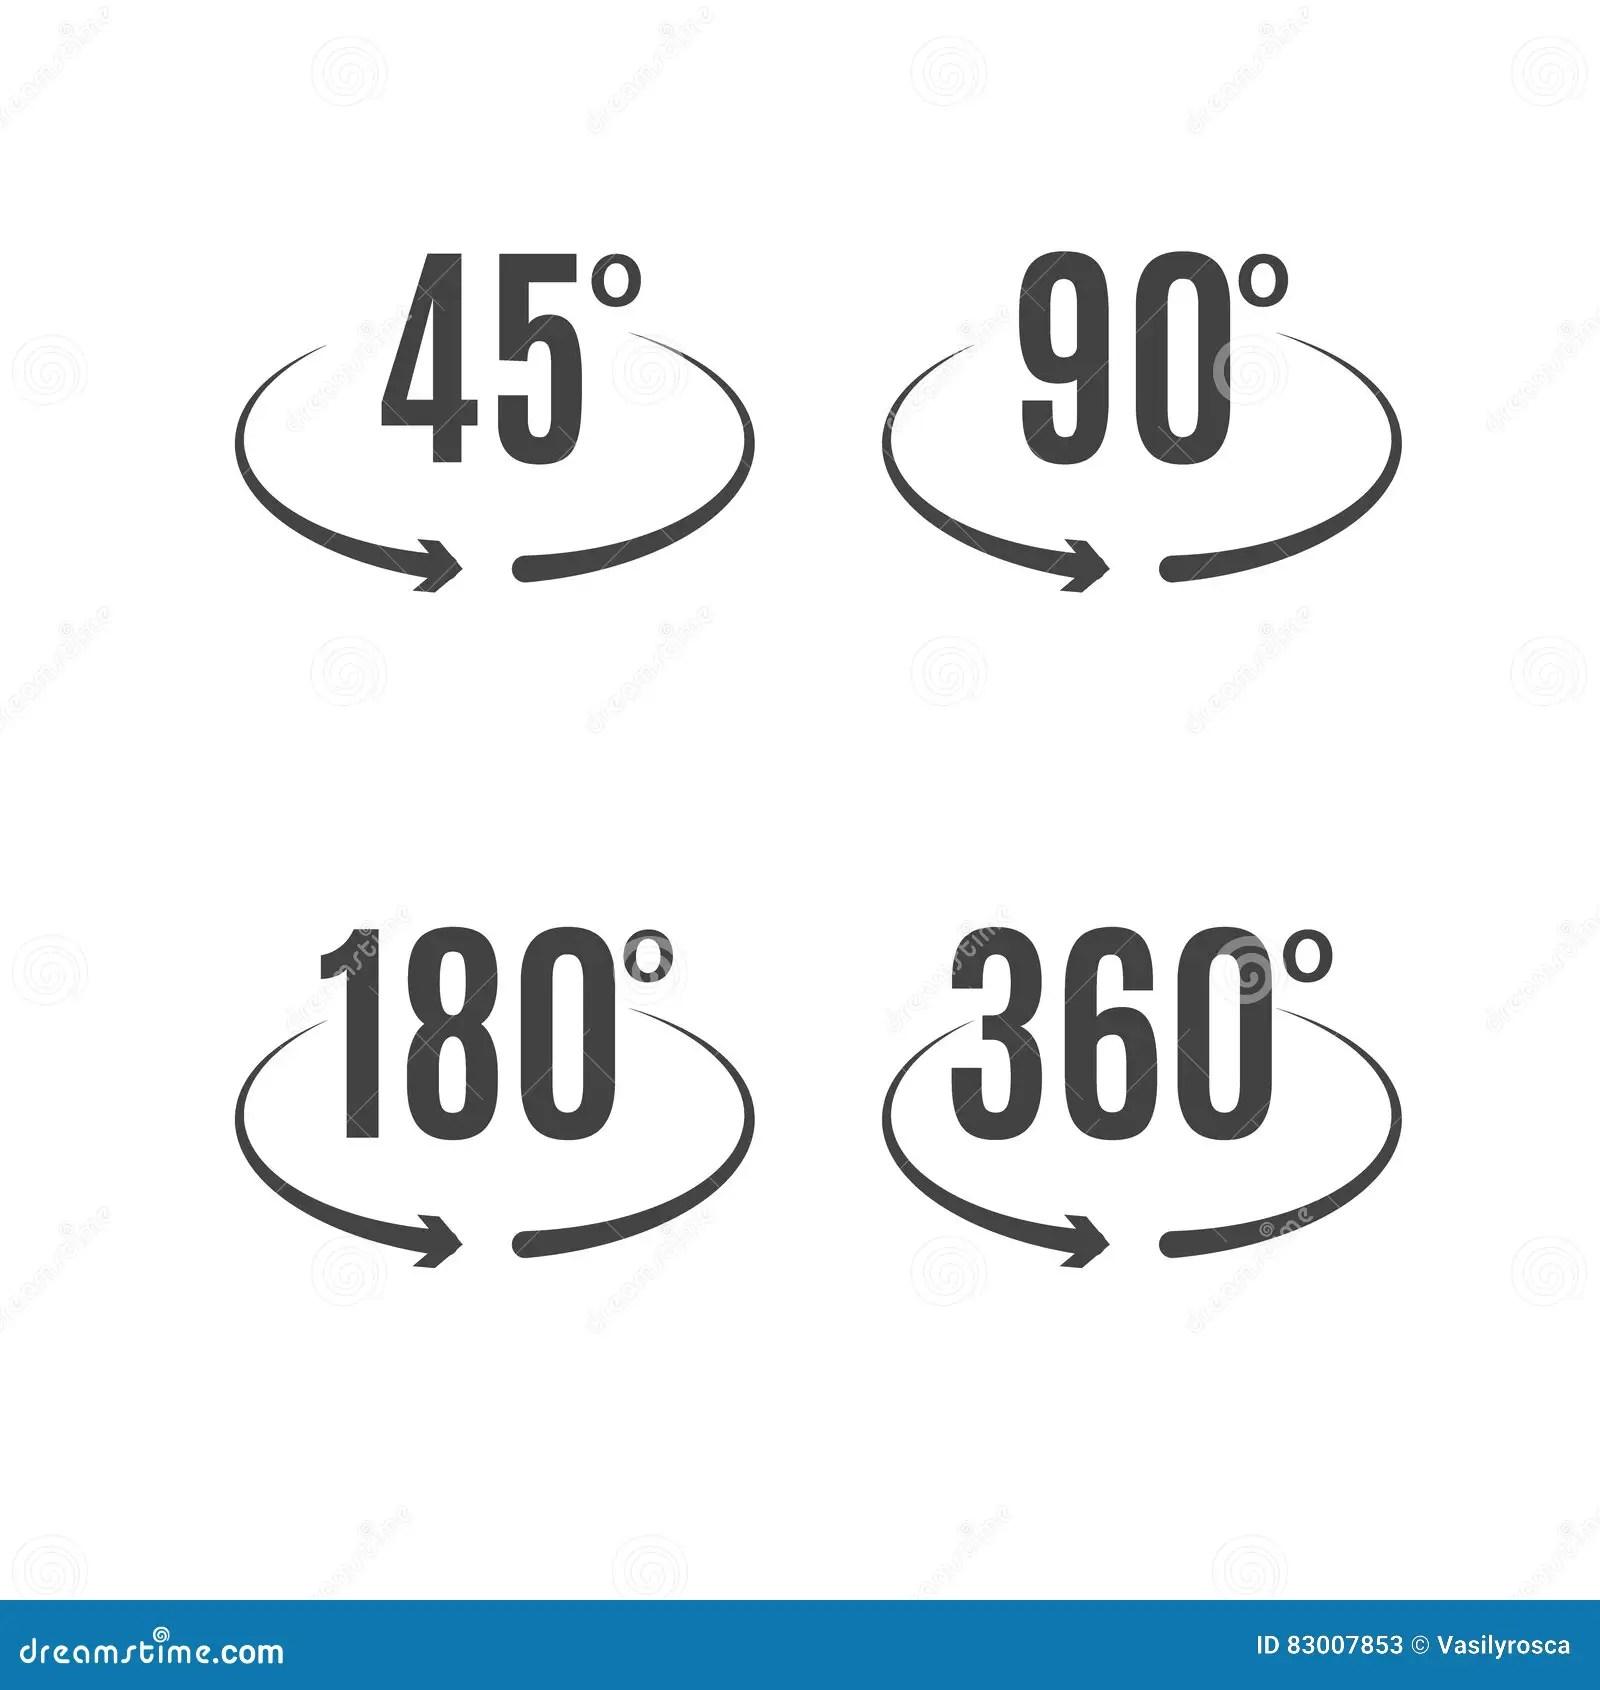 Angle Degrees Icons Vector Design. Arrows Rotation Circle